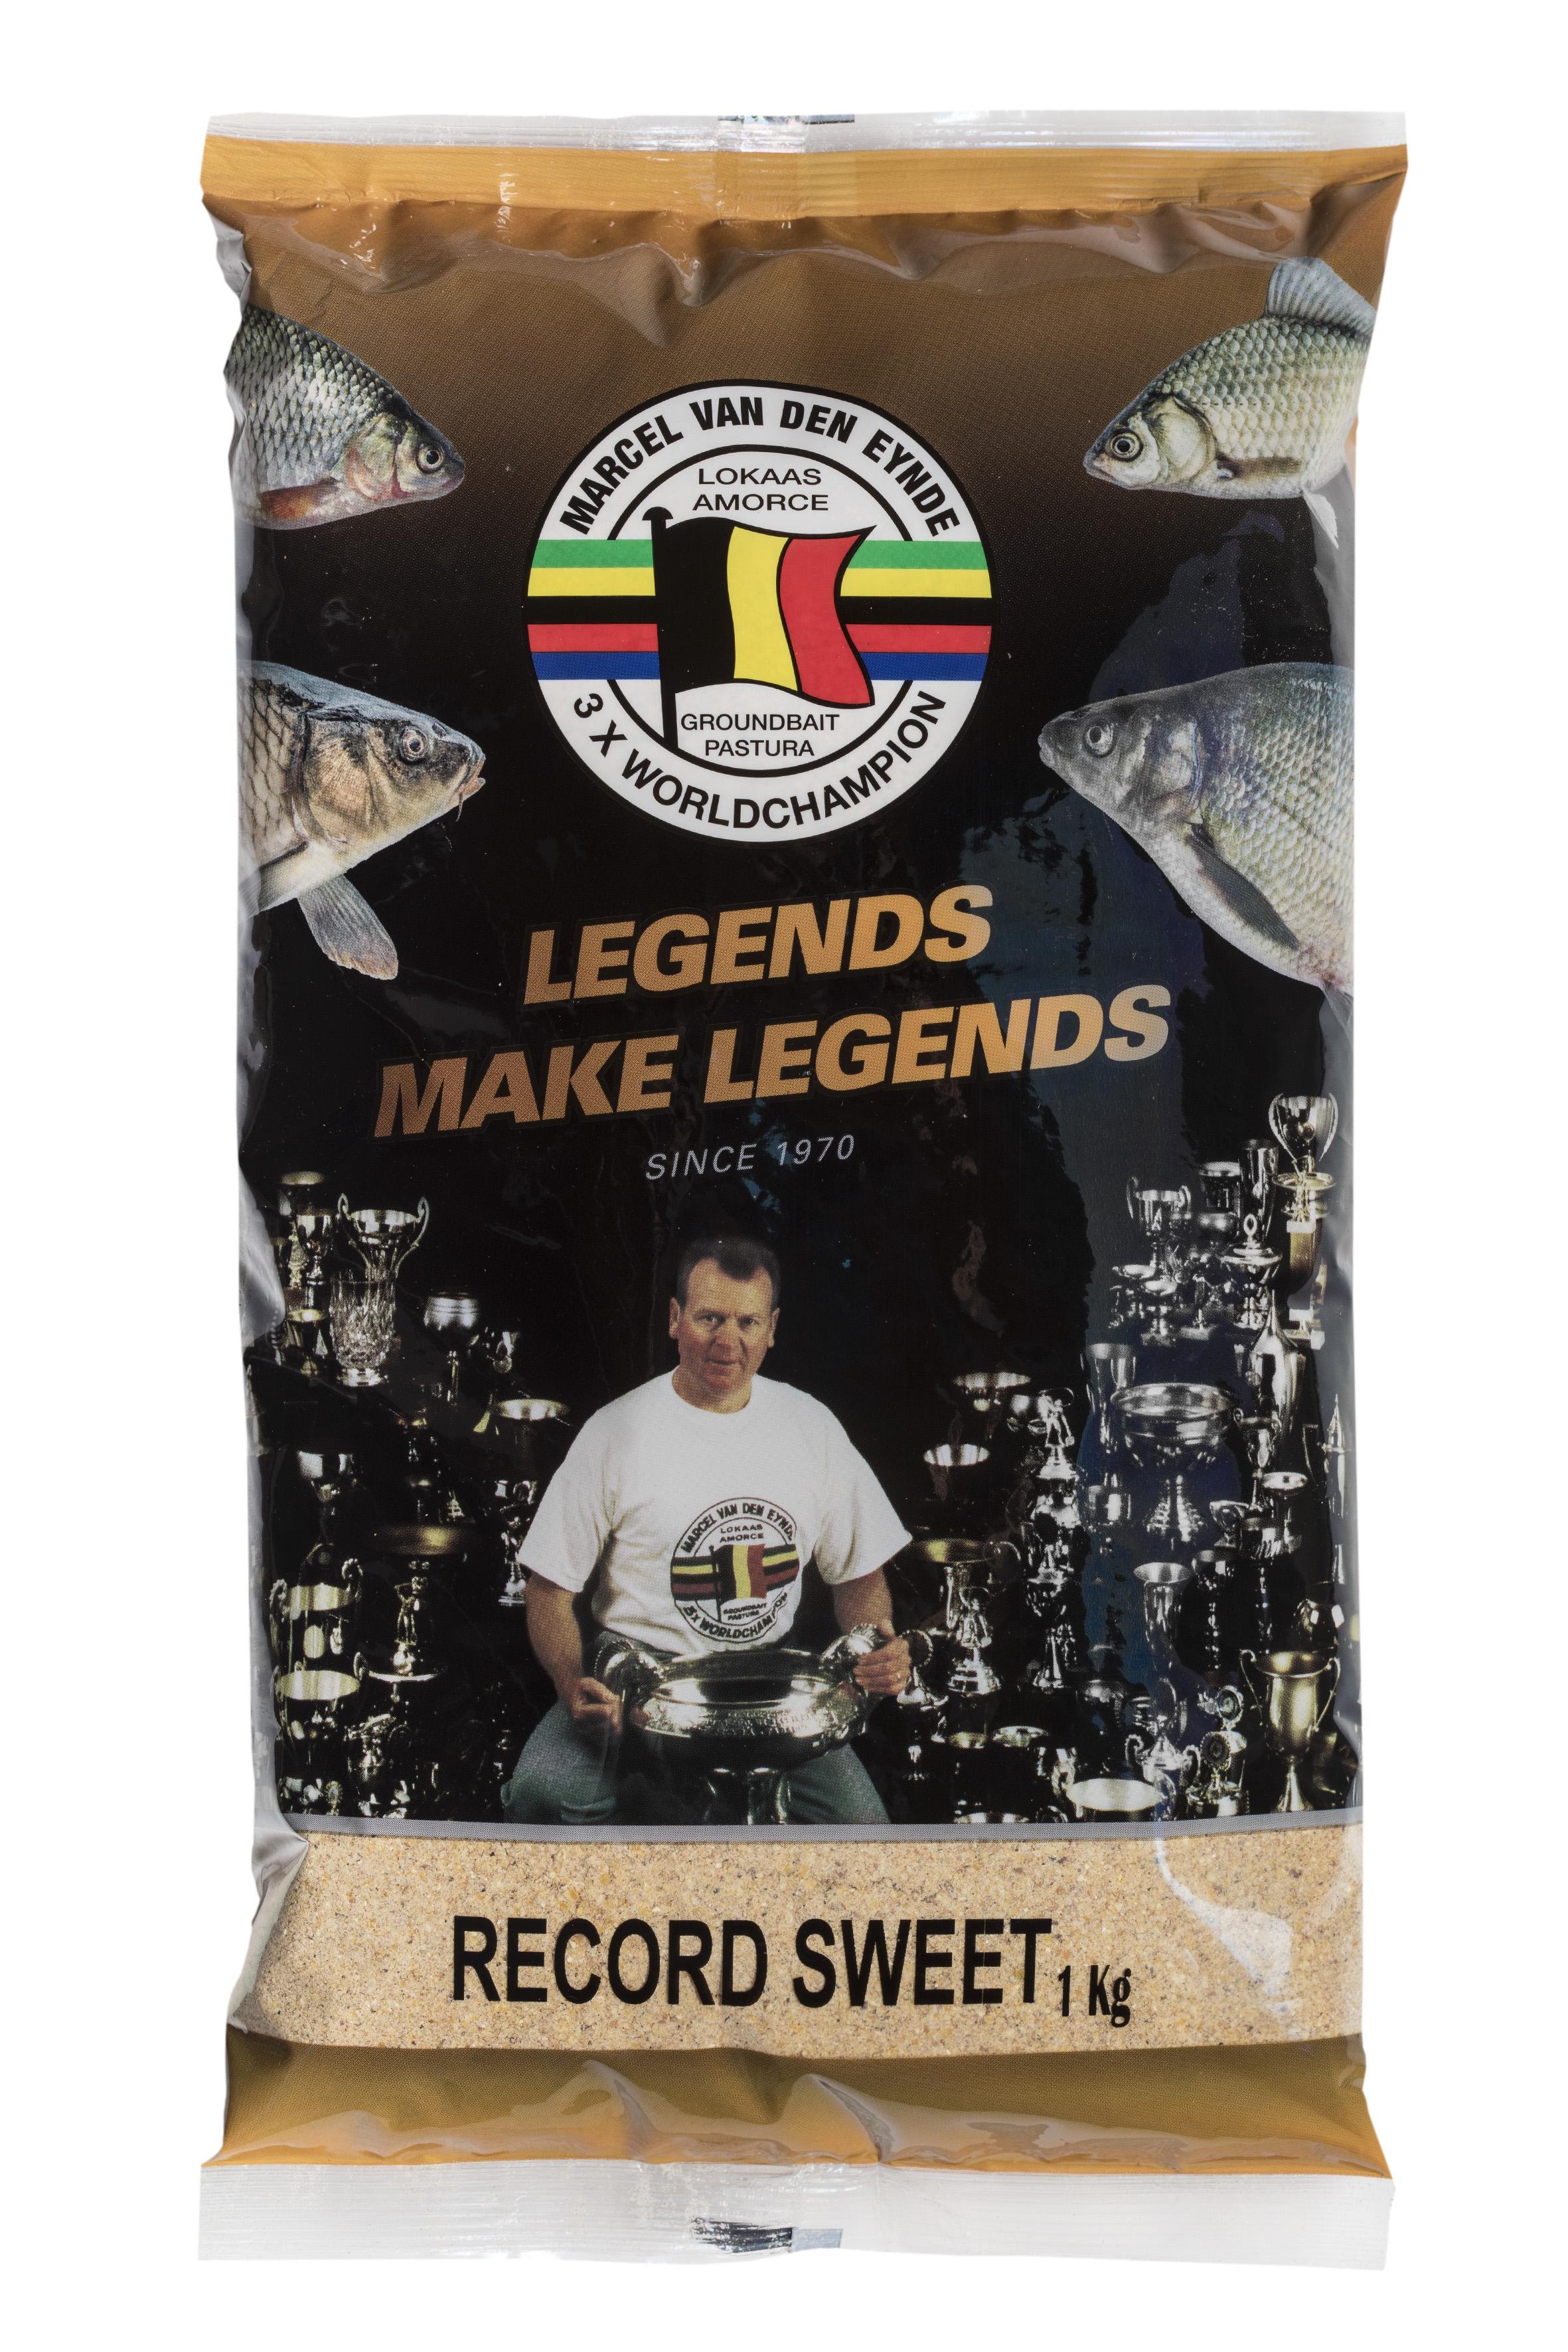 MVDE Krmná zmes Record Sweet (1kg)